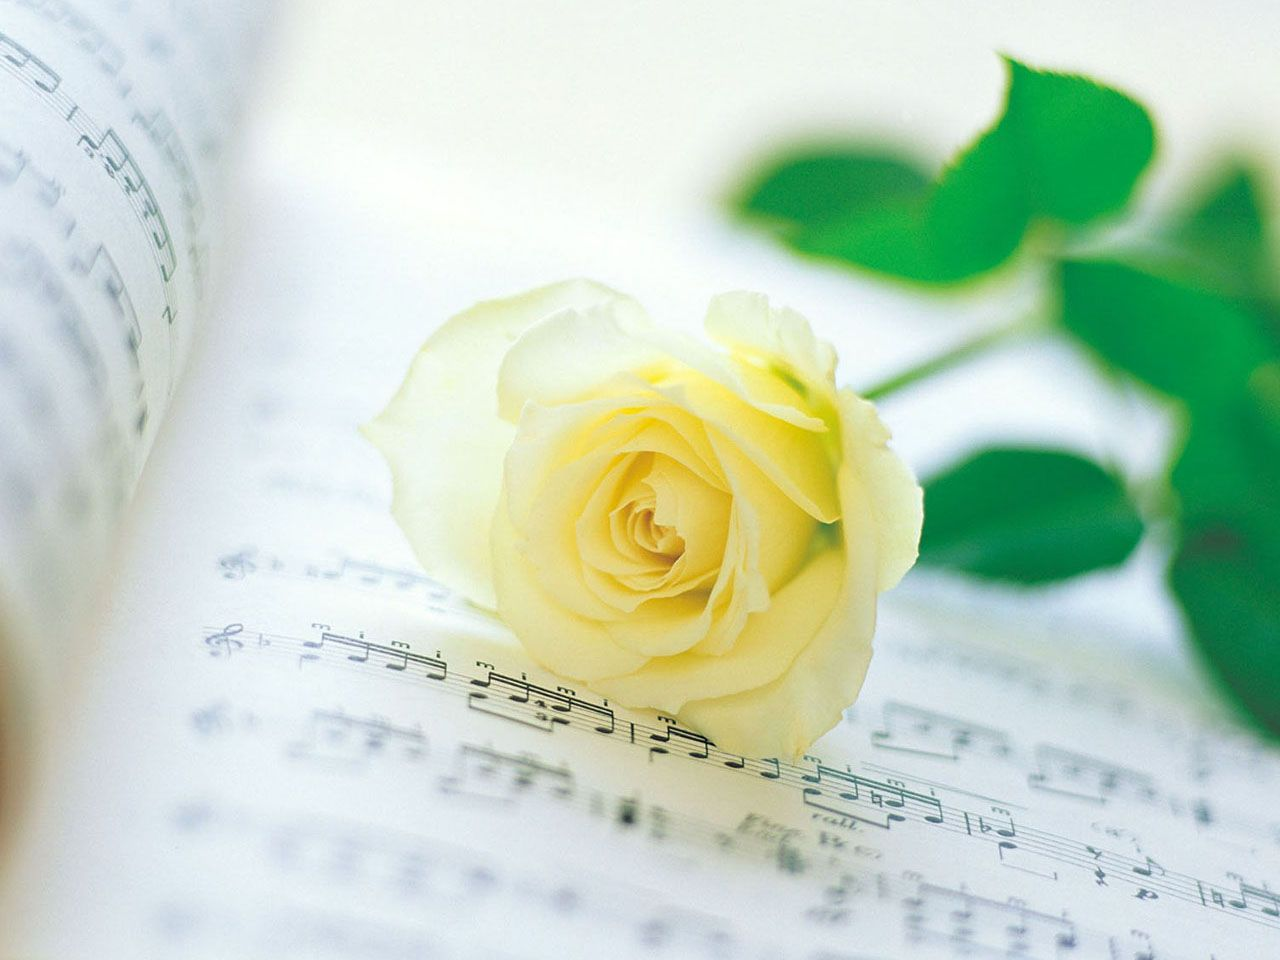 Hd wallpaper yellow rose - Yellow Roses Wallpaper Rose Wallpaper Yellow Rose Hd Wallpaper Download Free